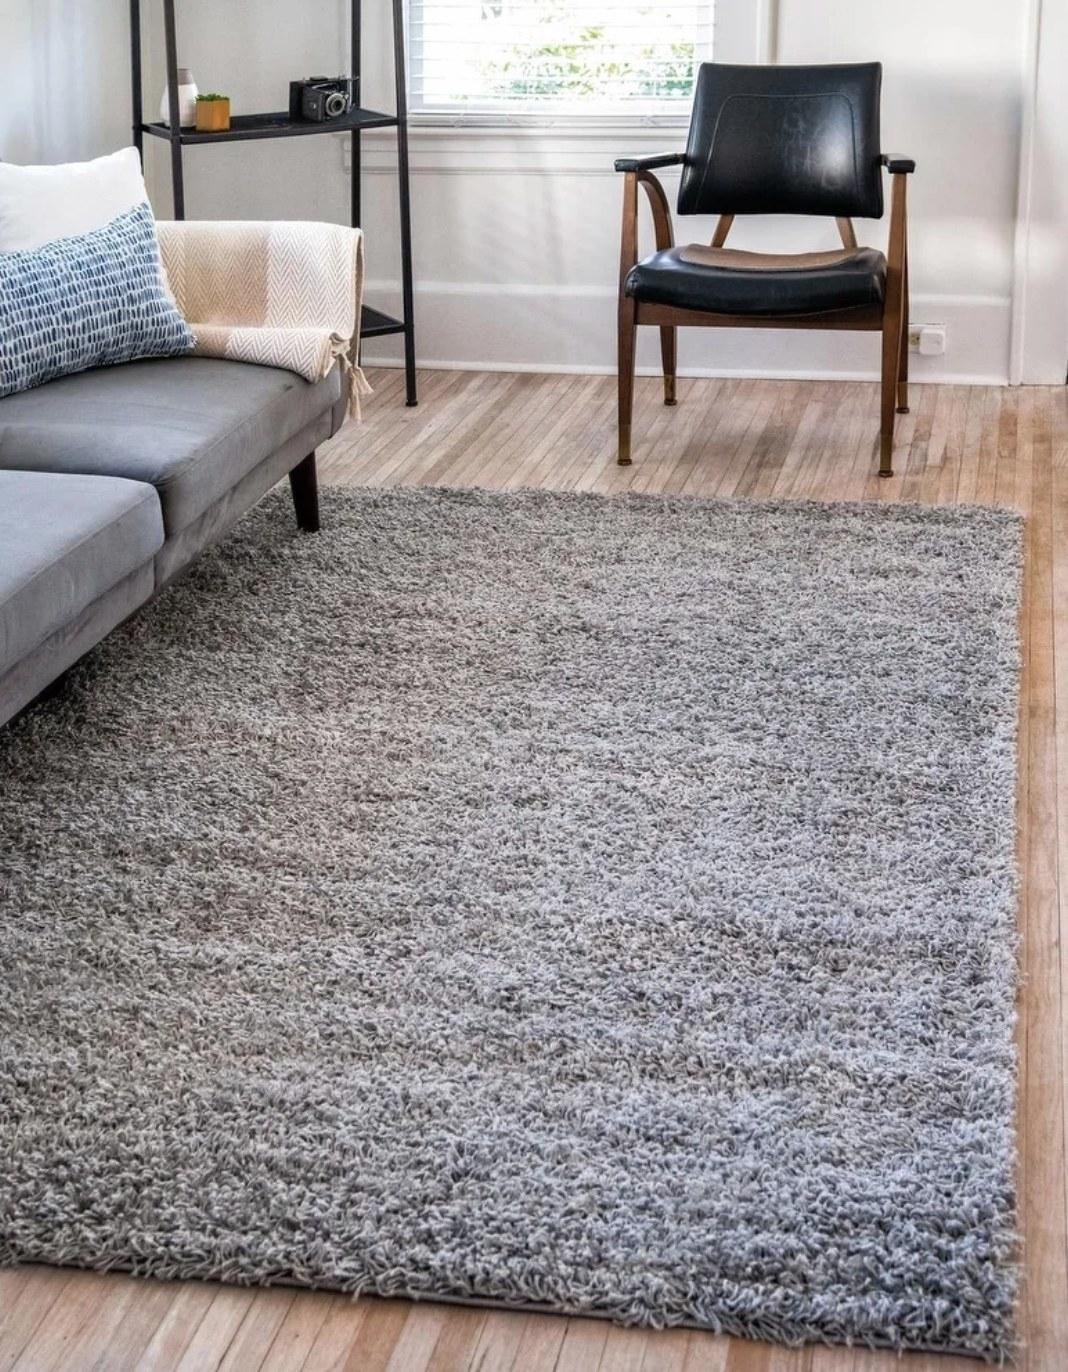 The shag rug on a hardwood floor